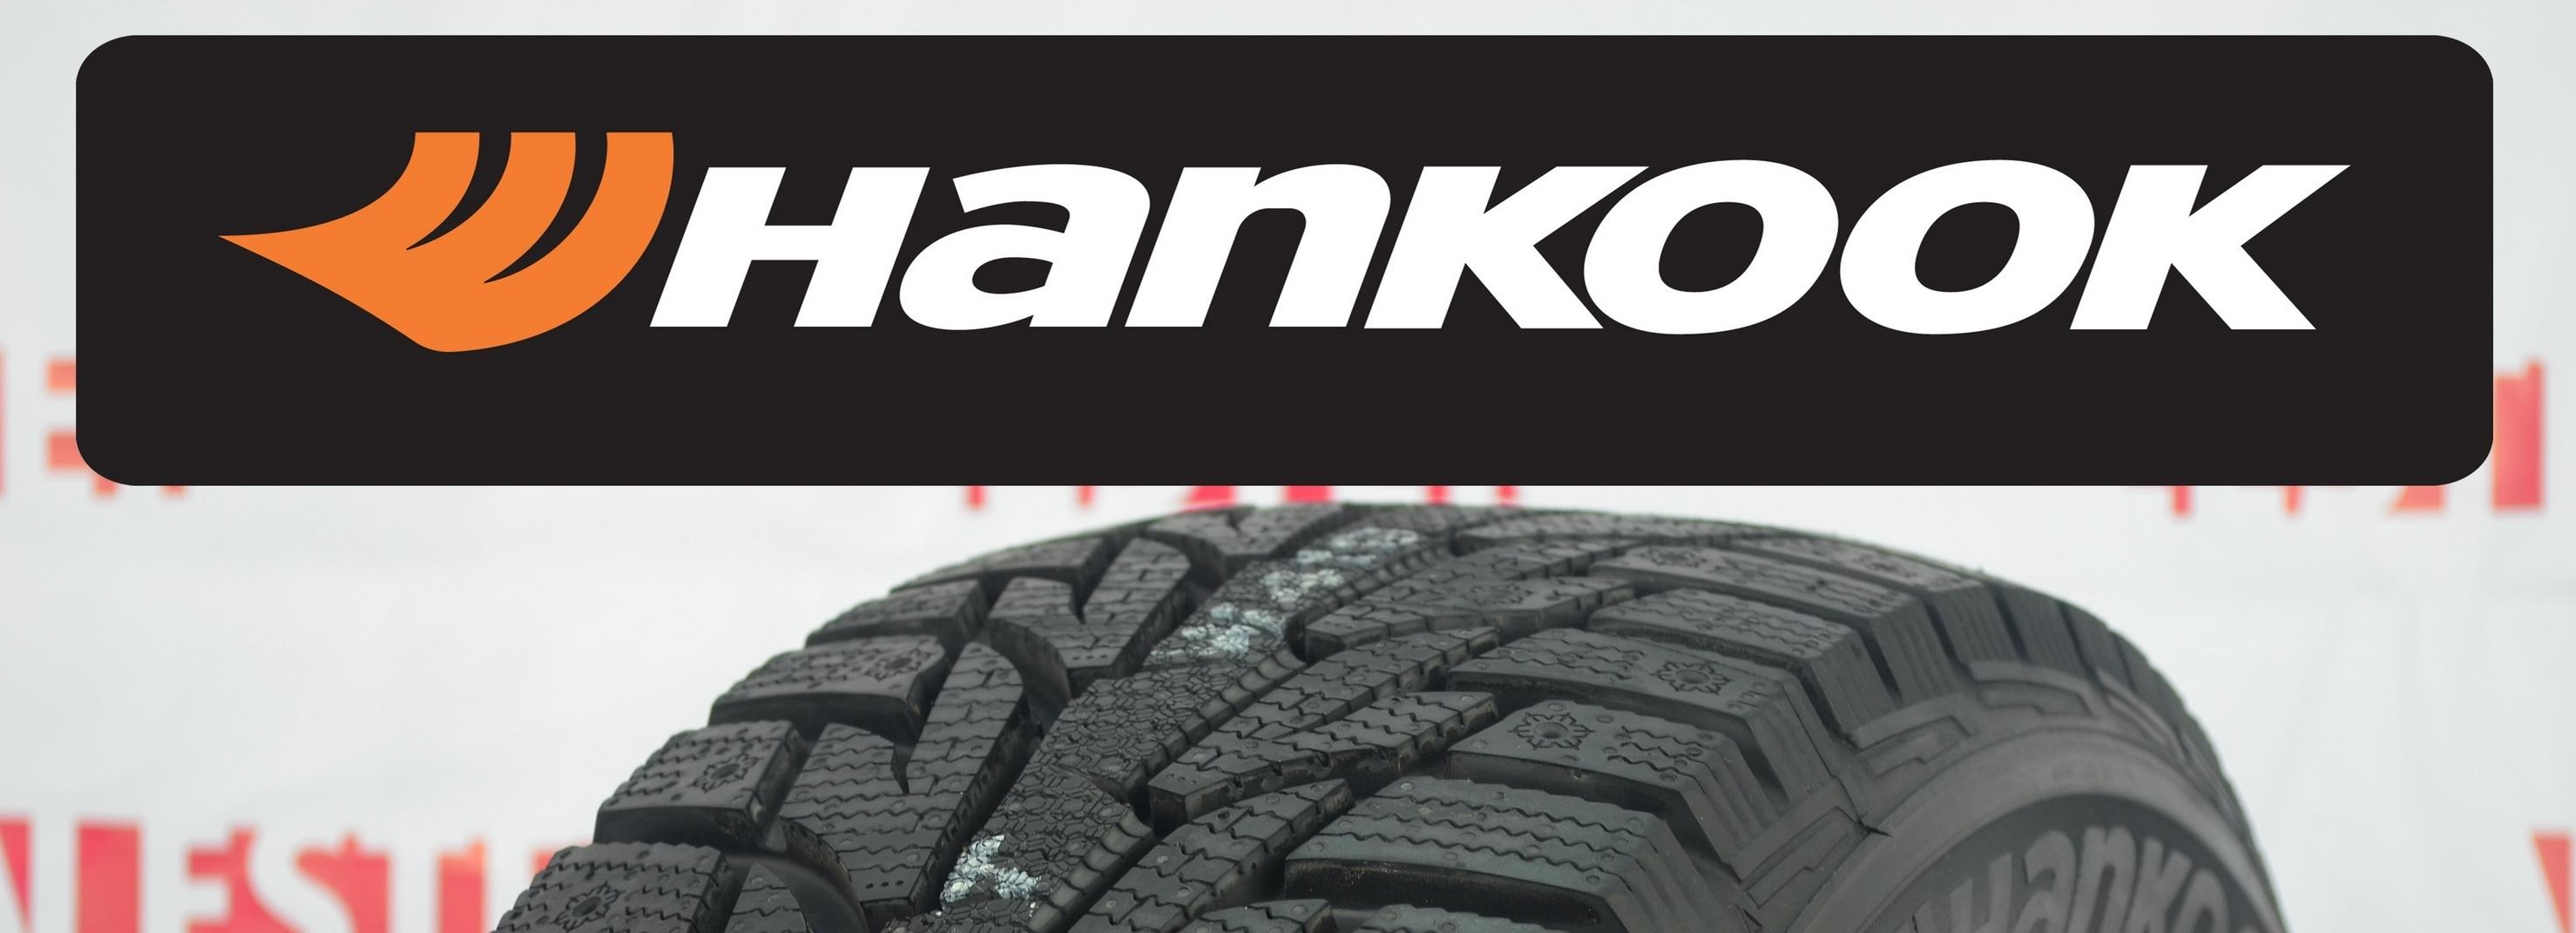 Обзор зимней шины Hankook Winteri*Pike RS W419